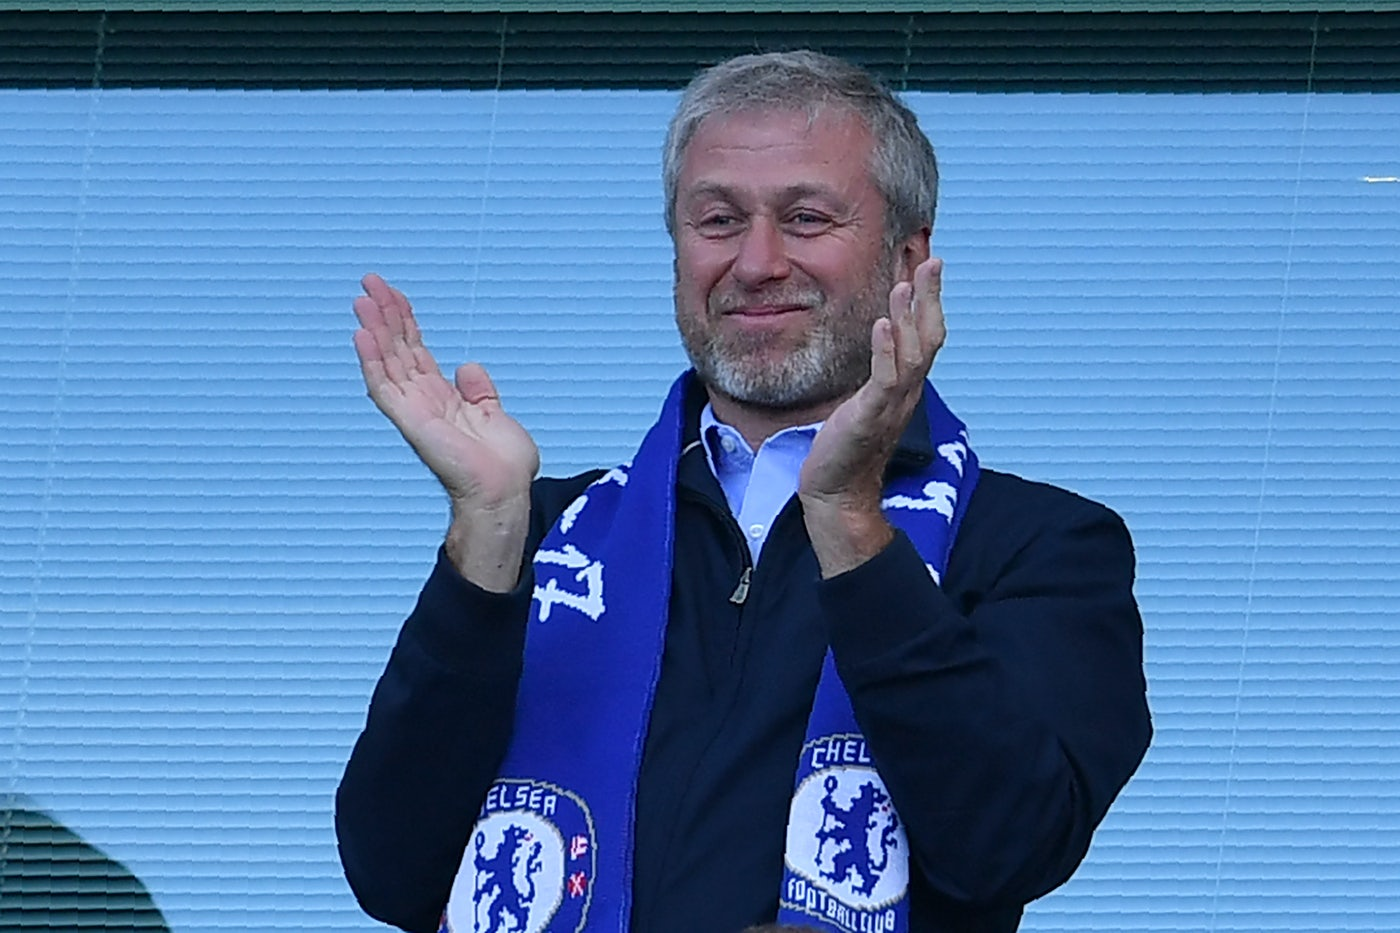 Roman Abramovich, Chelsea's Russian owner